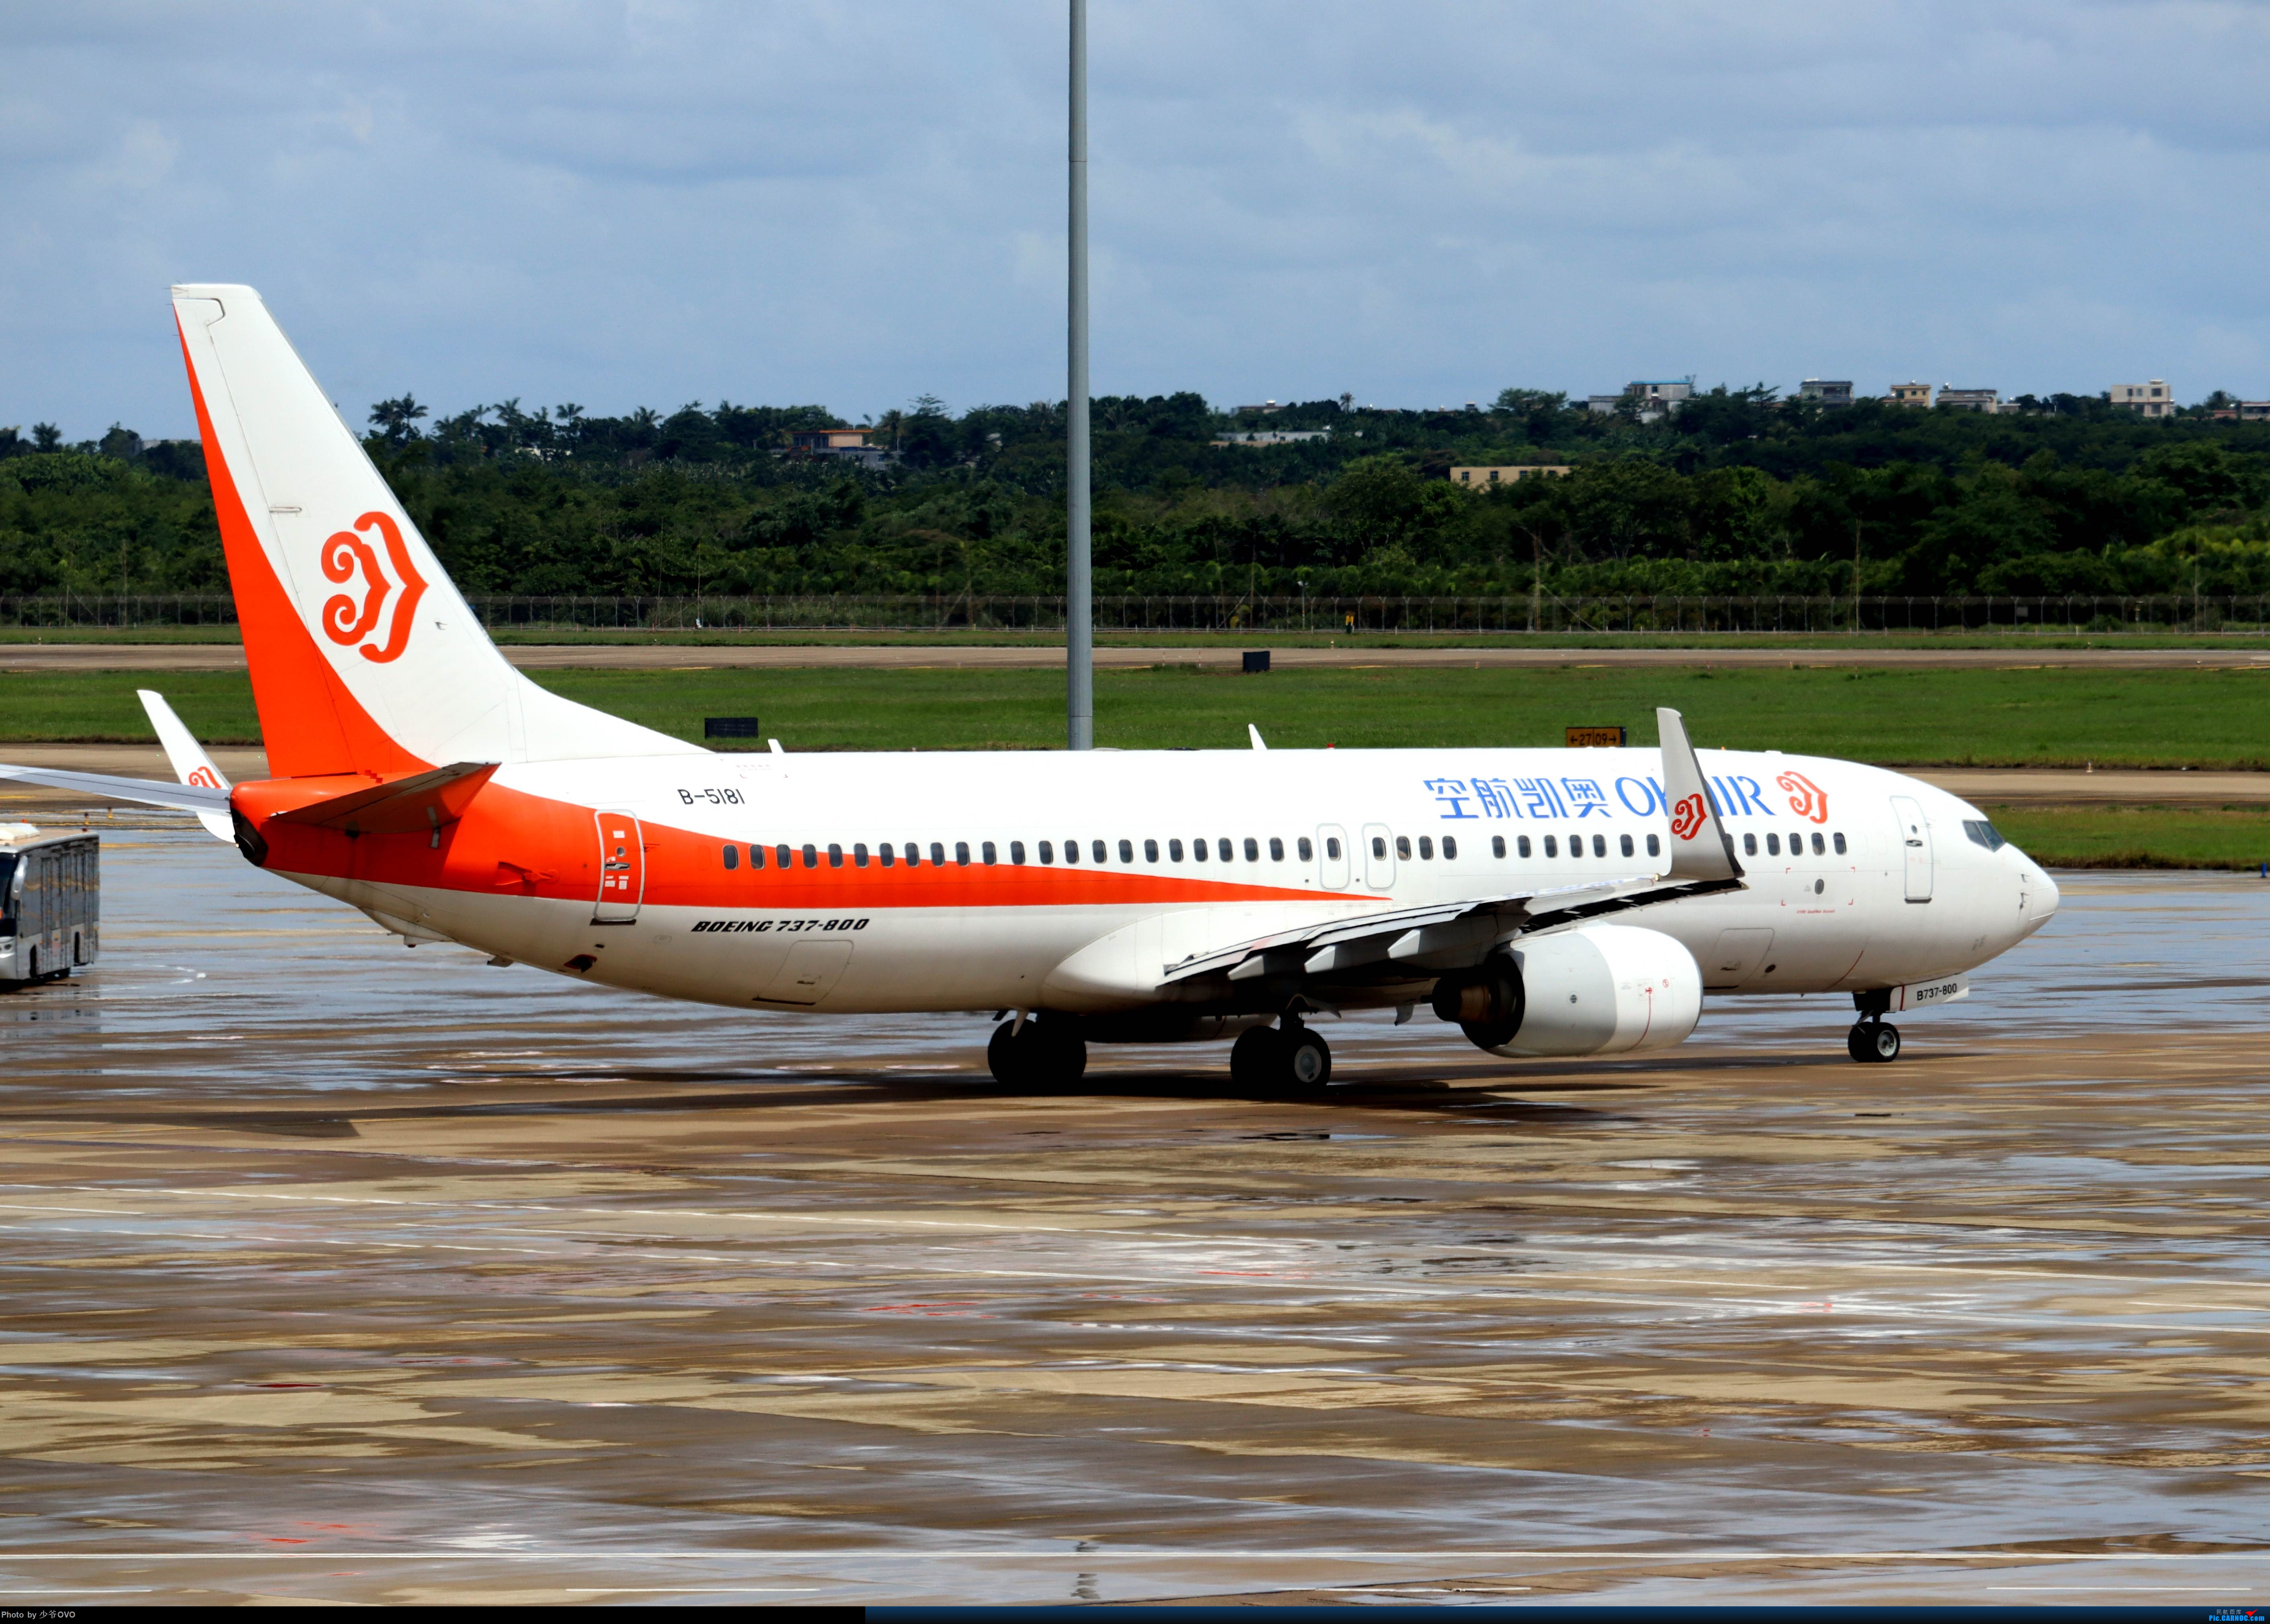 Re:[原创]少爷的HAK往返随拍 BOEING 737-800 B-5181 中国海口美兰国际机场